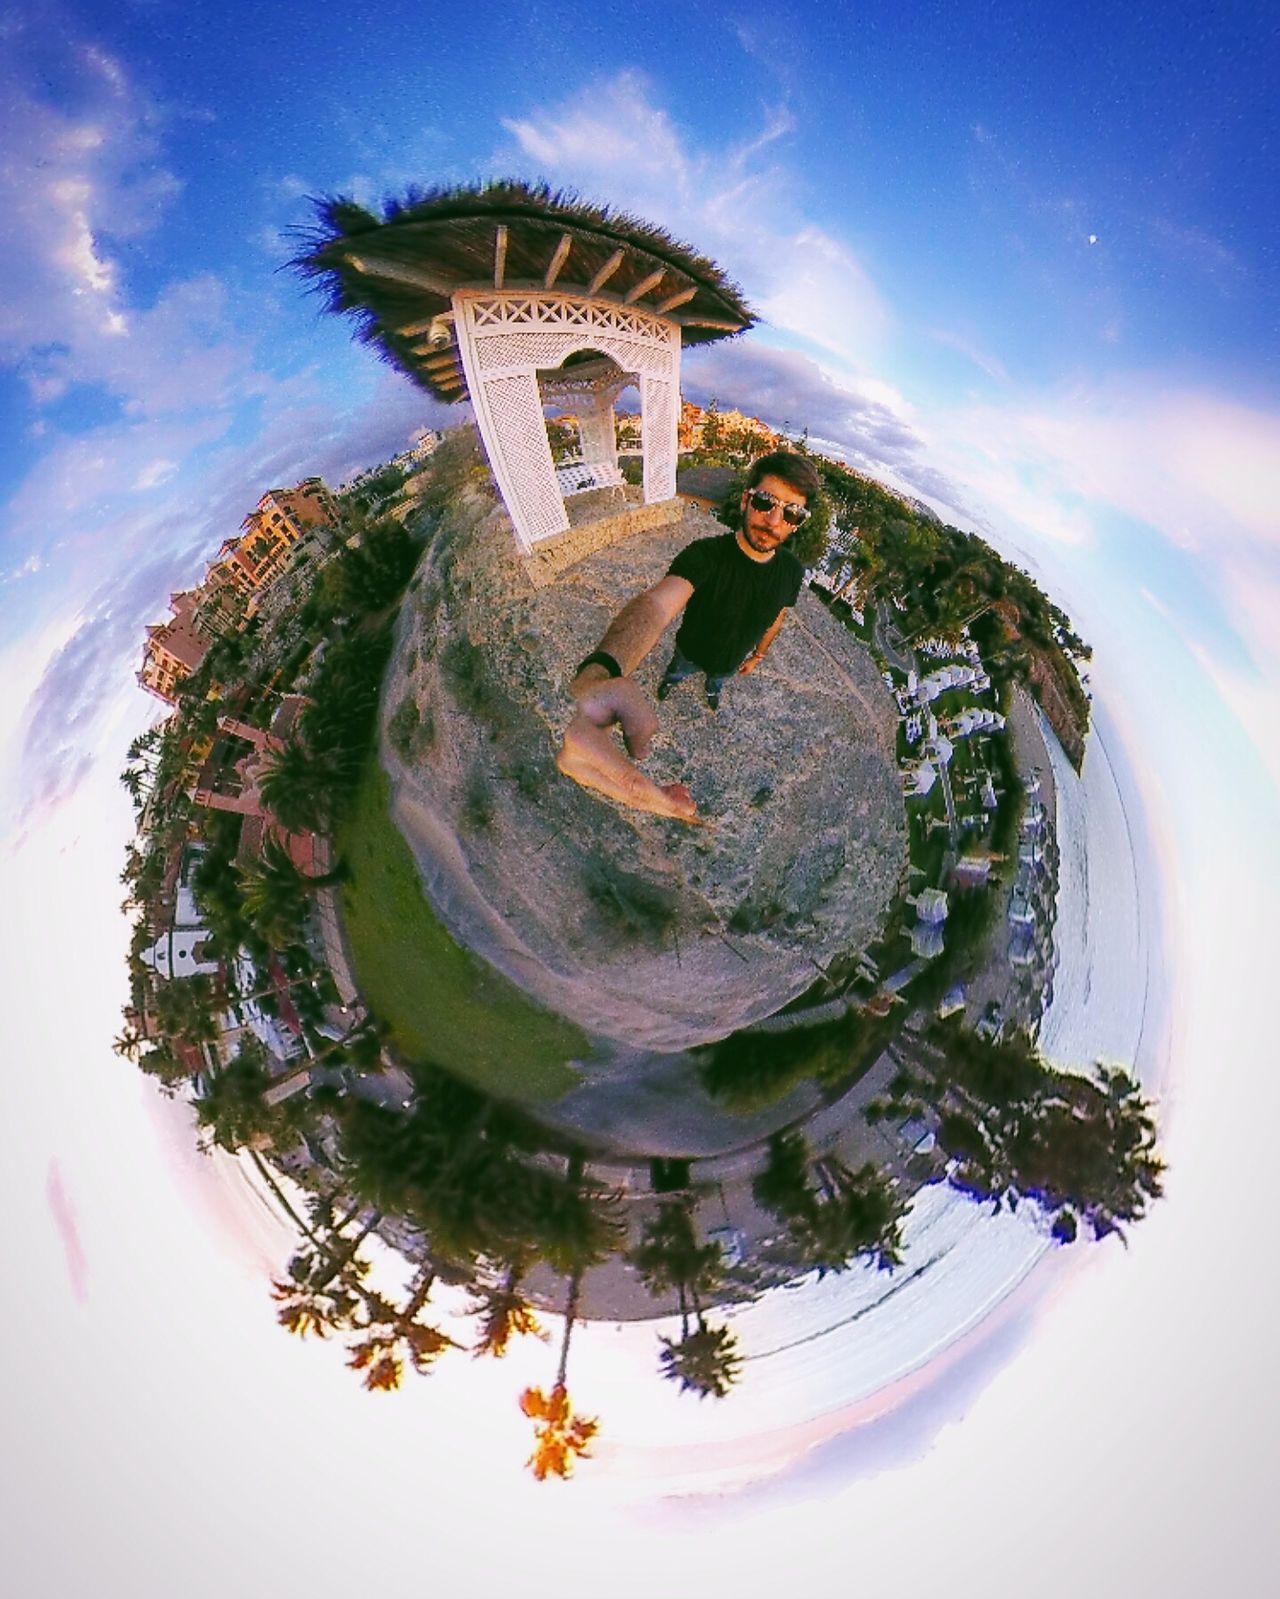 Me :)  ThatsMe Tinyplanet 360 360 Panorama Tenerife Tenerife Island Teneriffa Canarias Canary Islands Bahía Del Duque Photographer